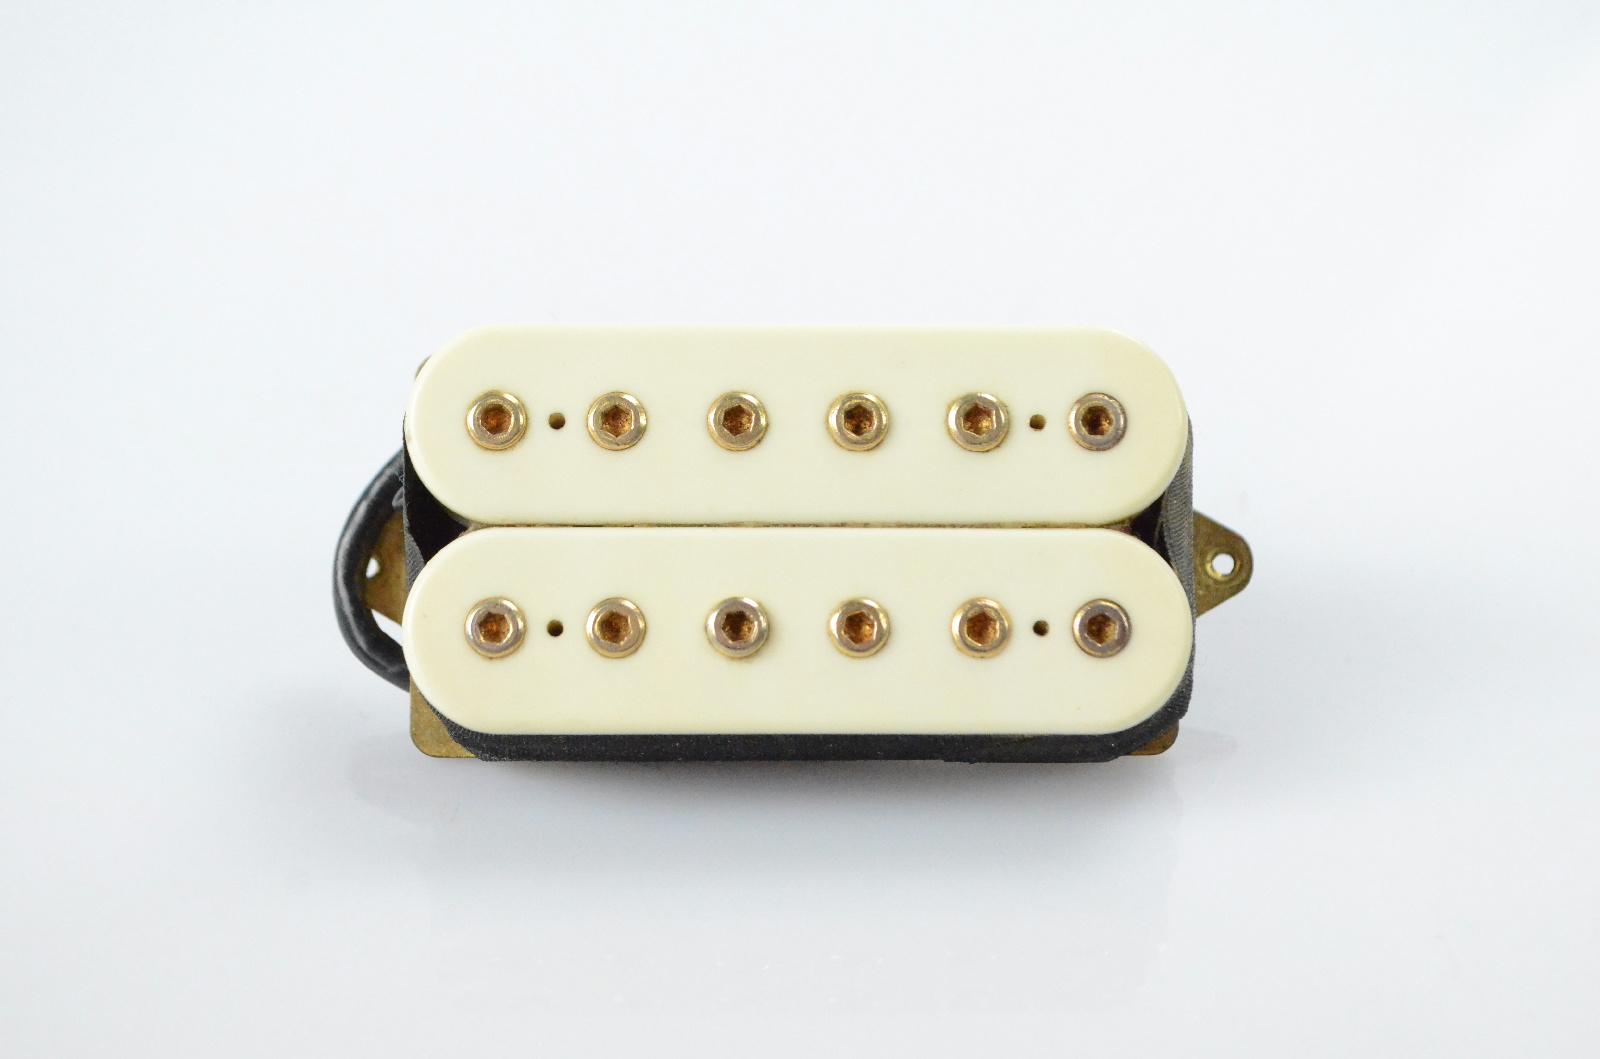 DiMarzio DP 151 Humbucker Guitar Pickup White w/ Gold Poles #32723